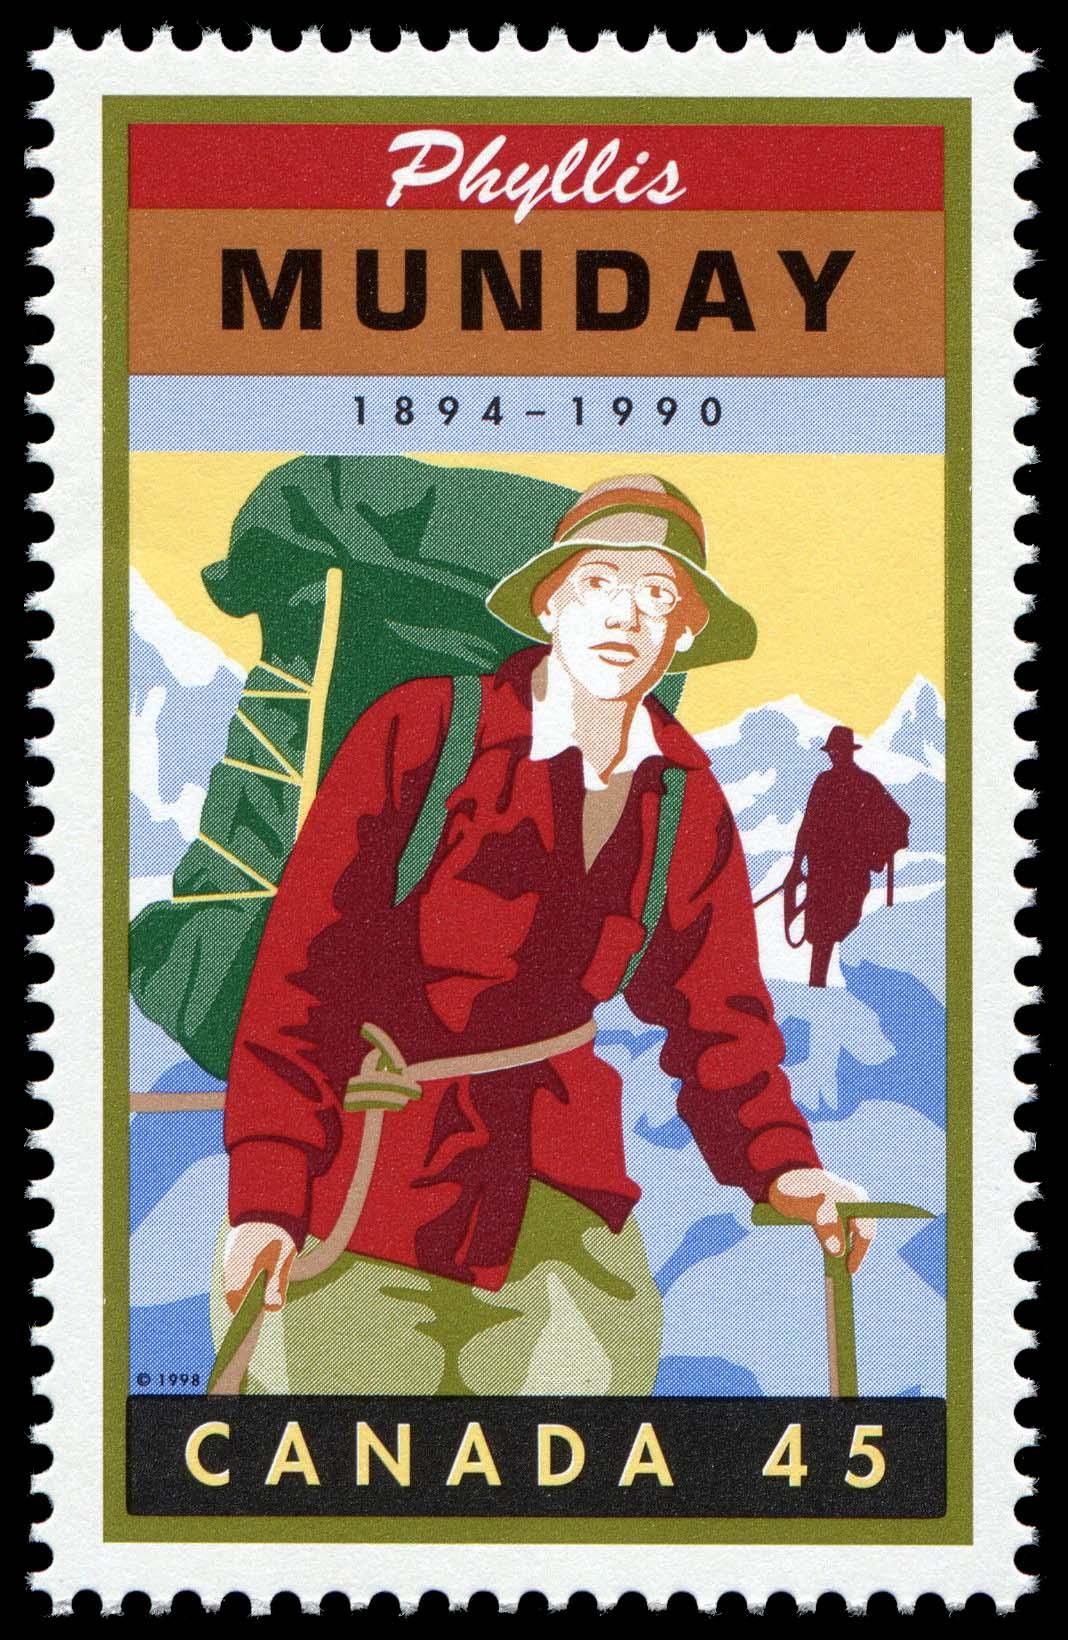 Phyllis Munday, 1894-1990 Canada Postage Stamp   Legendary Canadians